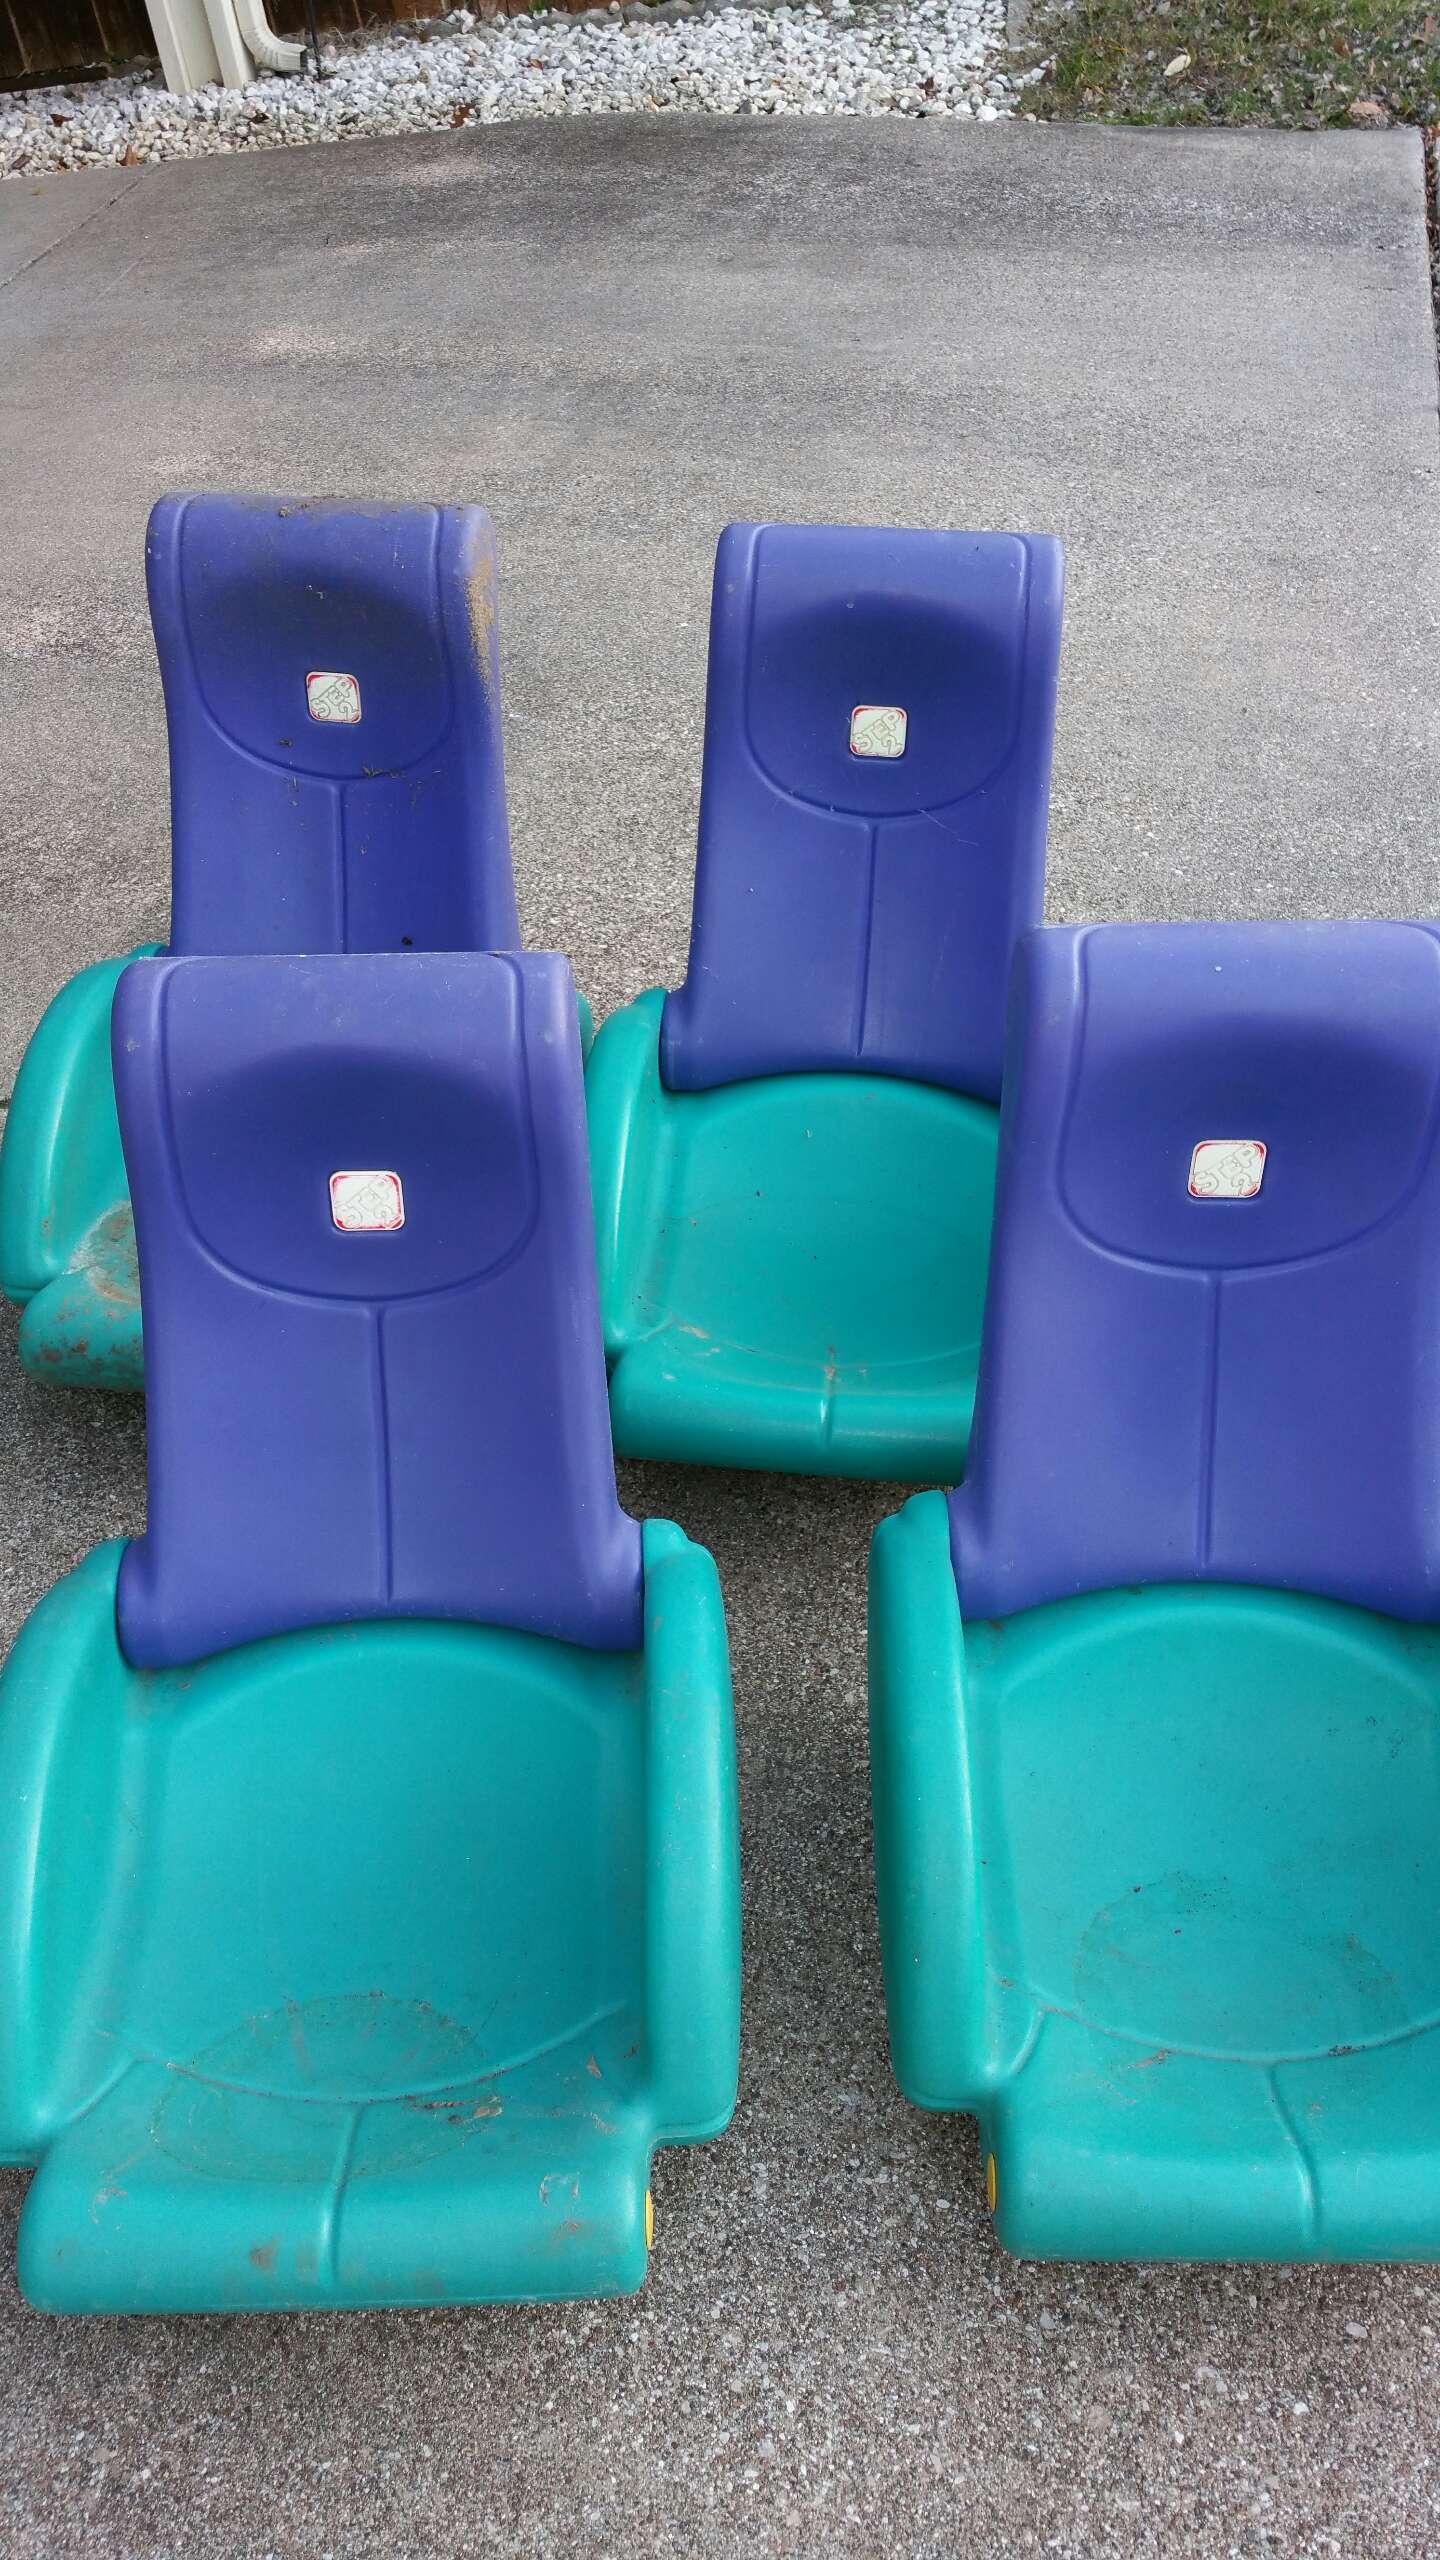 Step 2 rocking chair -  4 Step 2 Folding Rocking Chairs